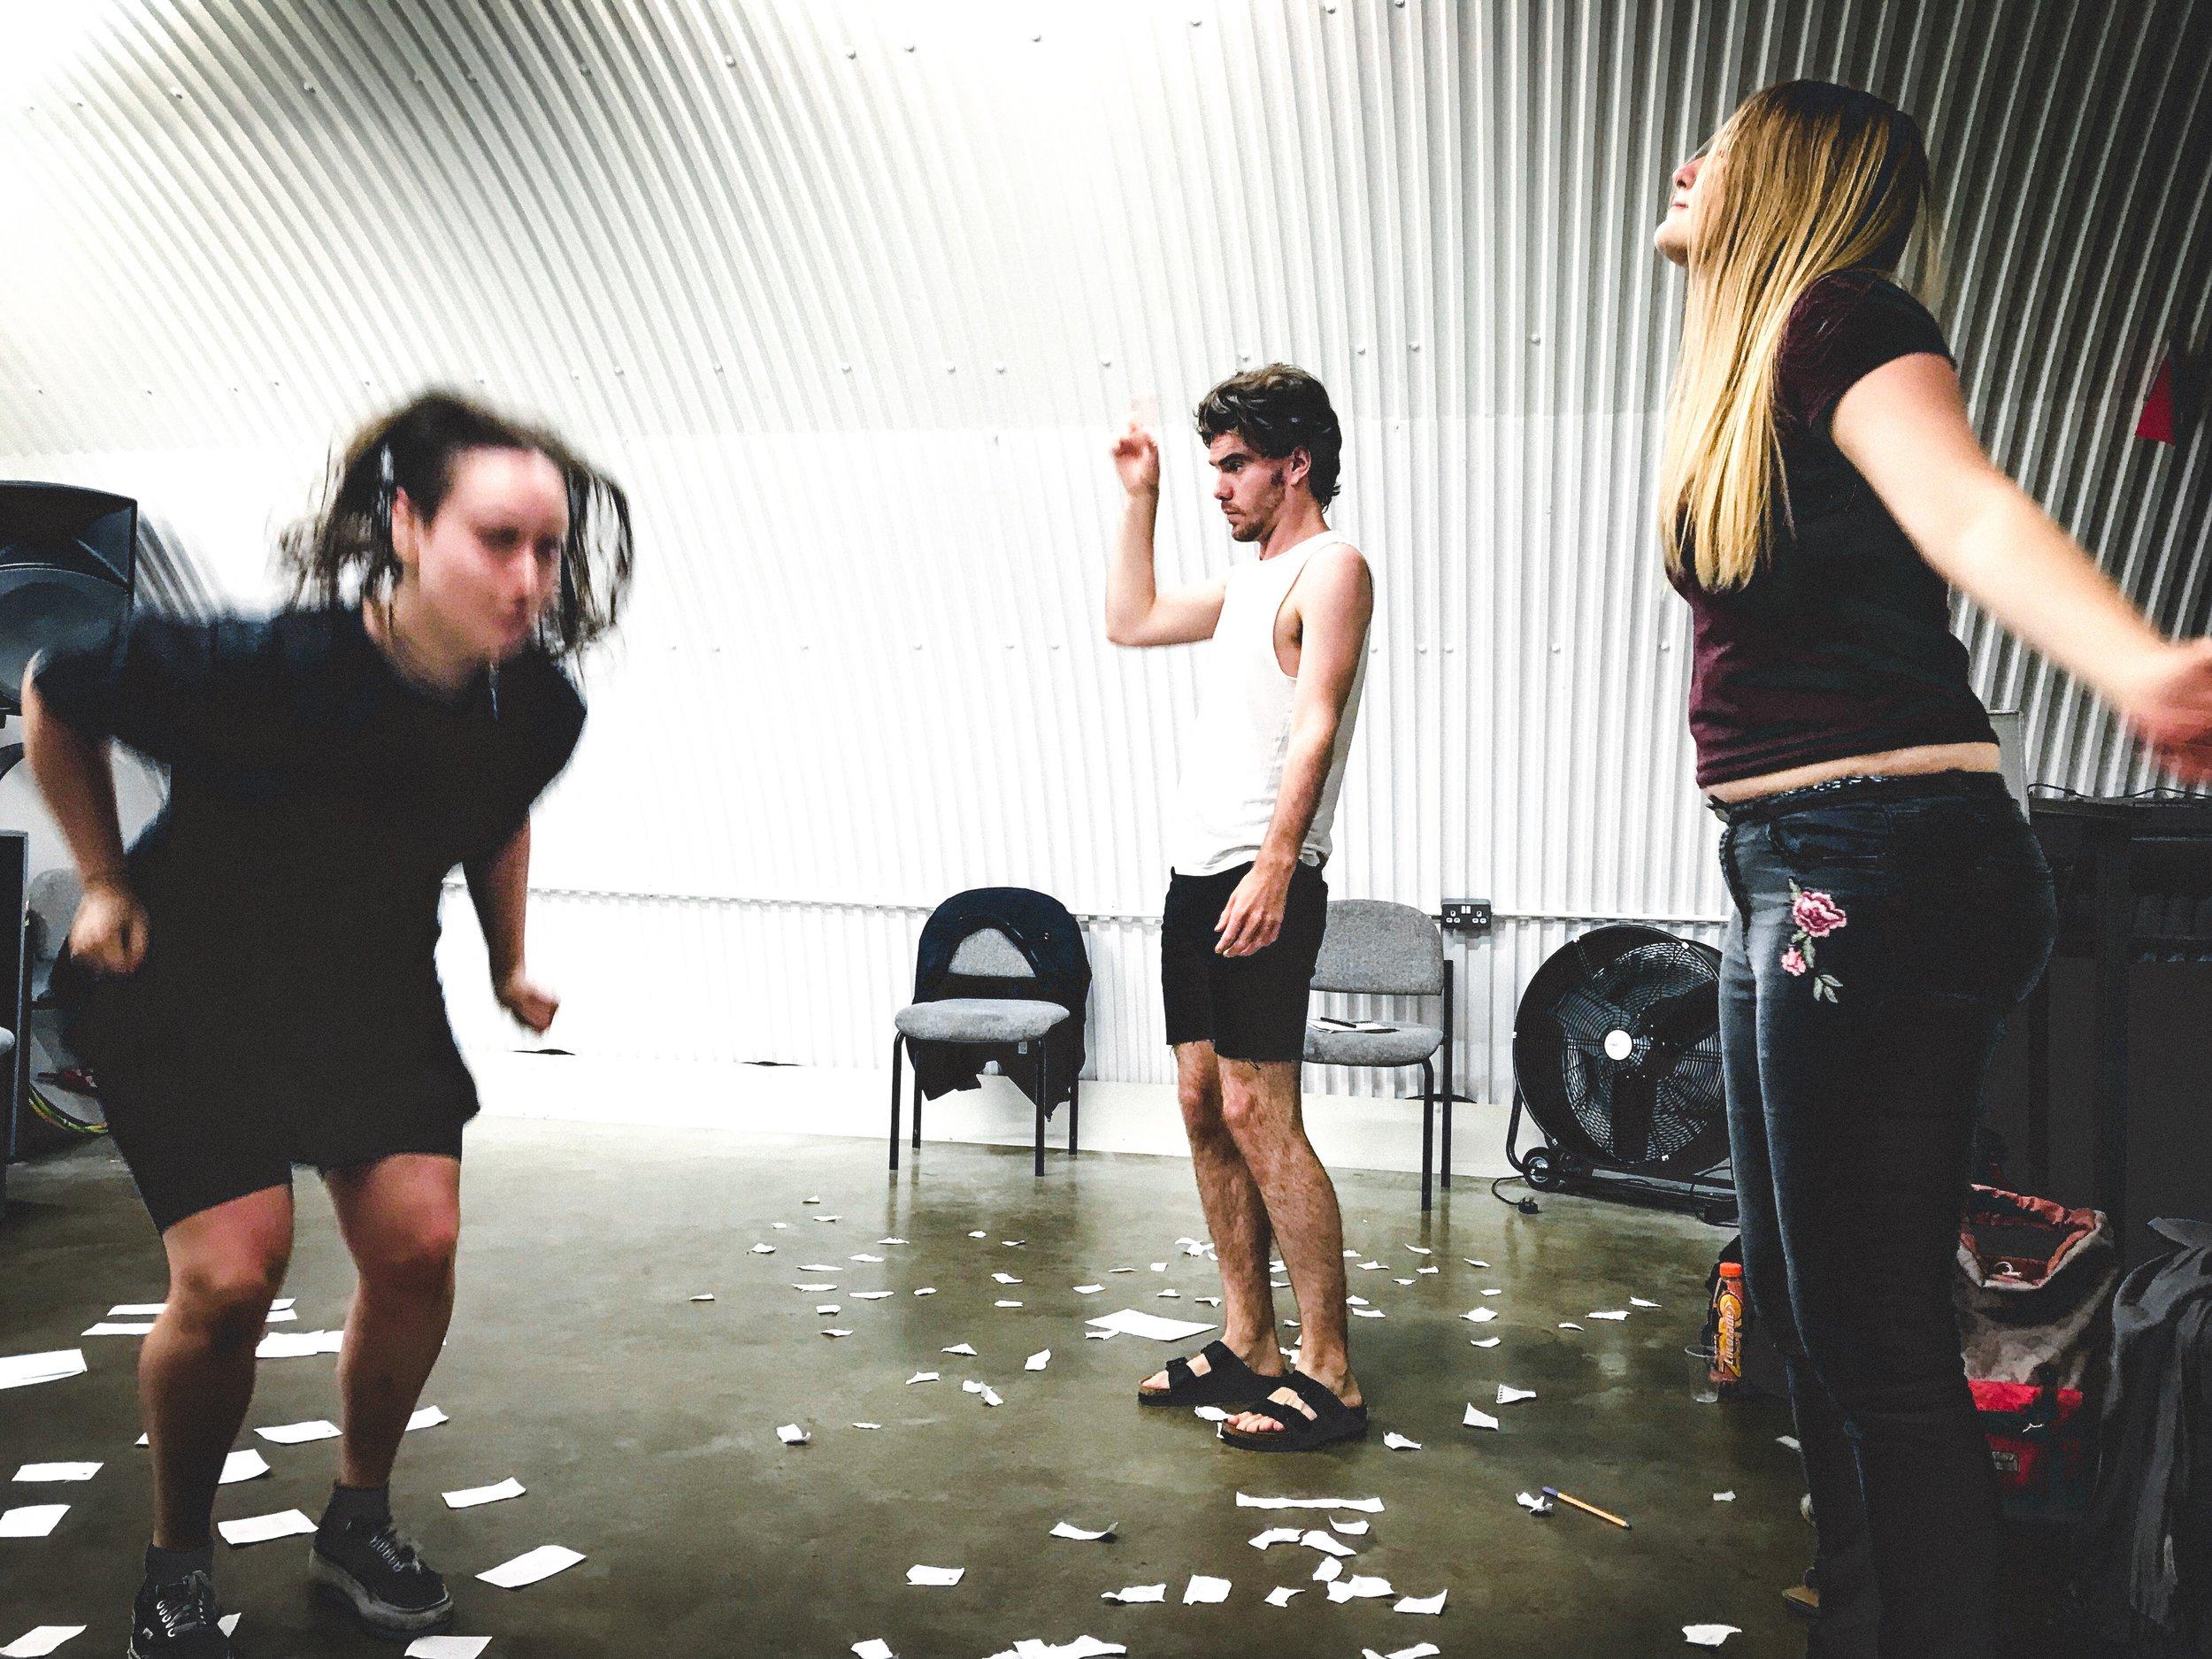 Pow! - a development scheme for young LGBTQ artists